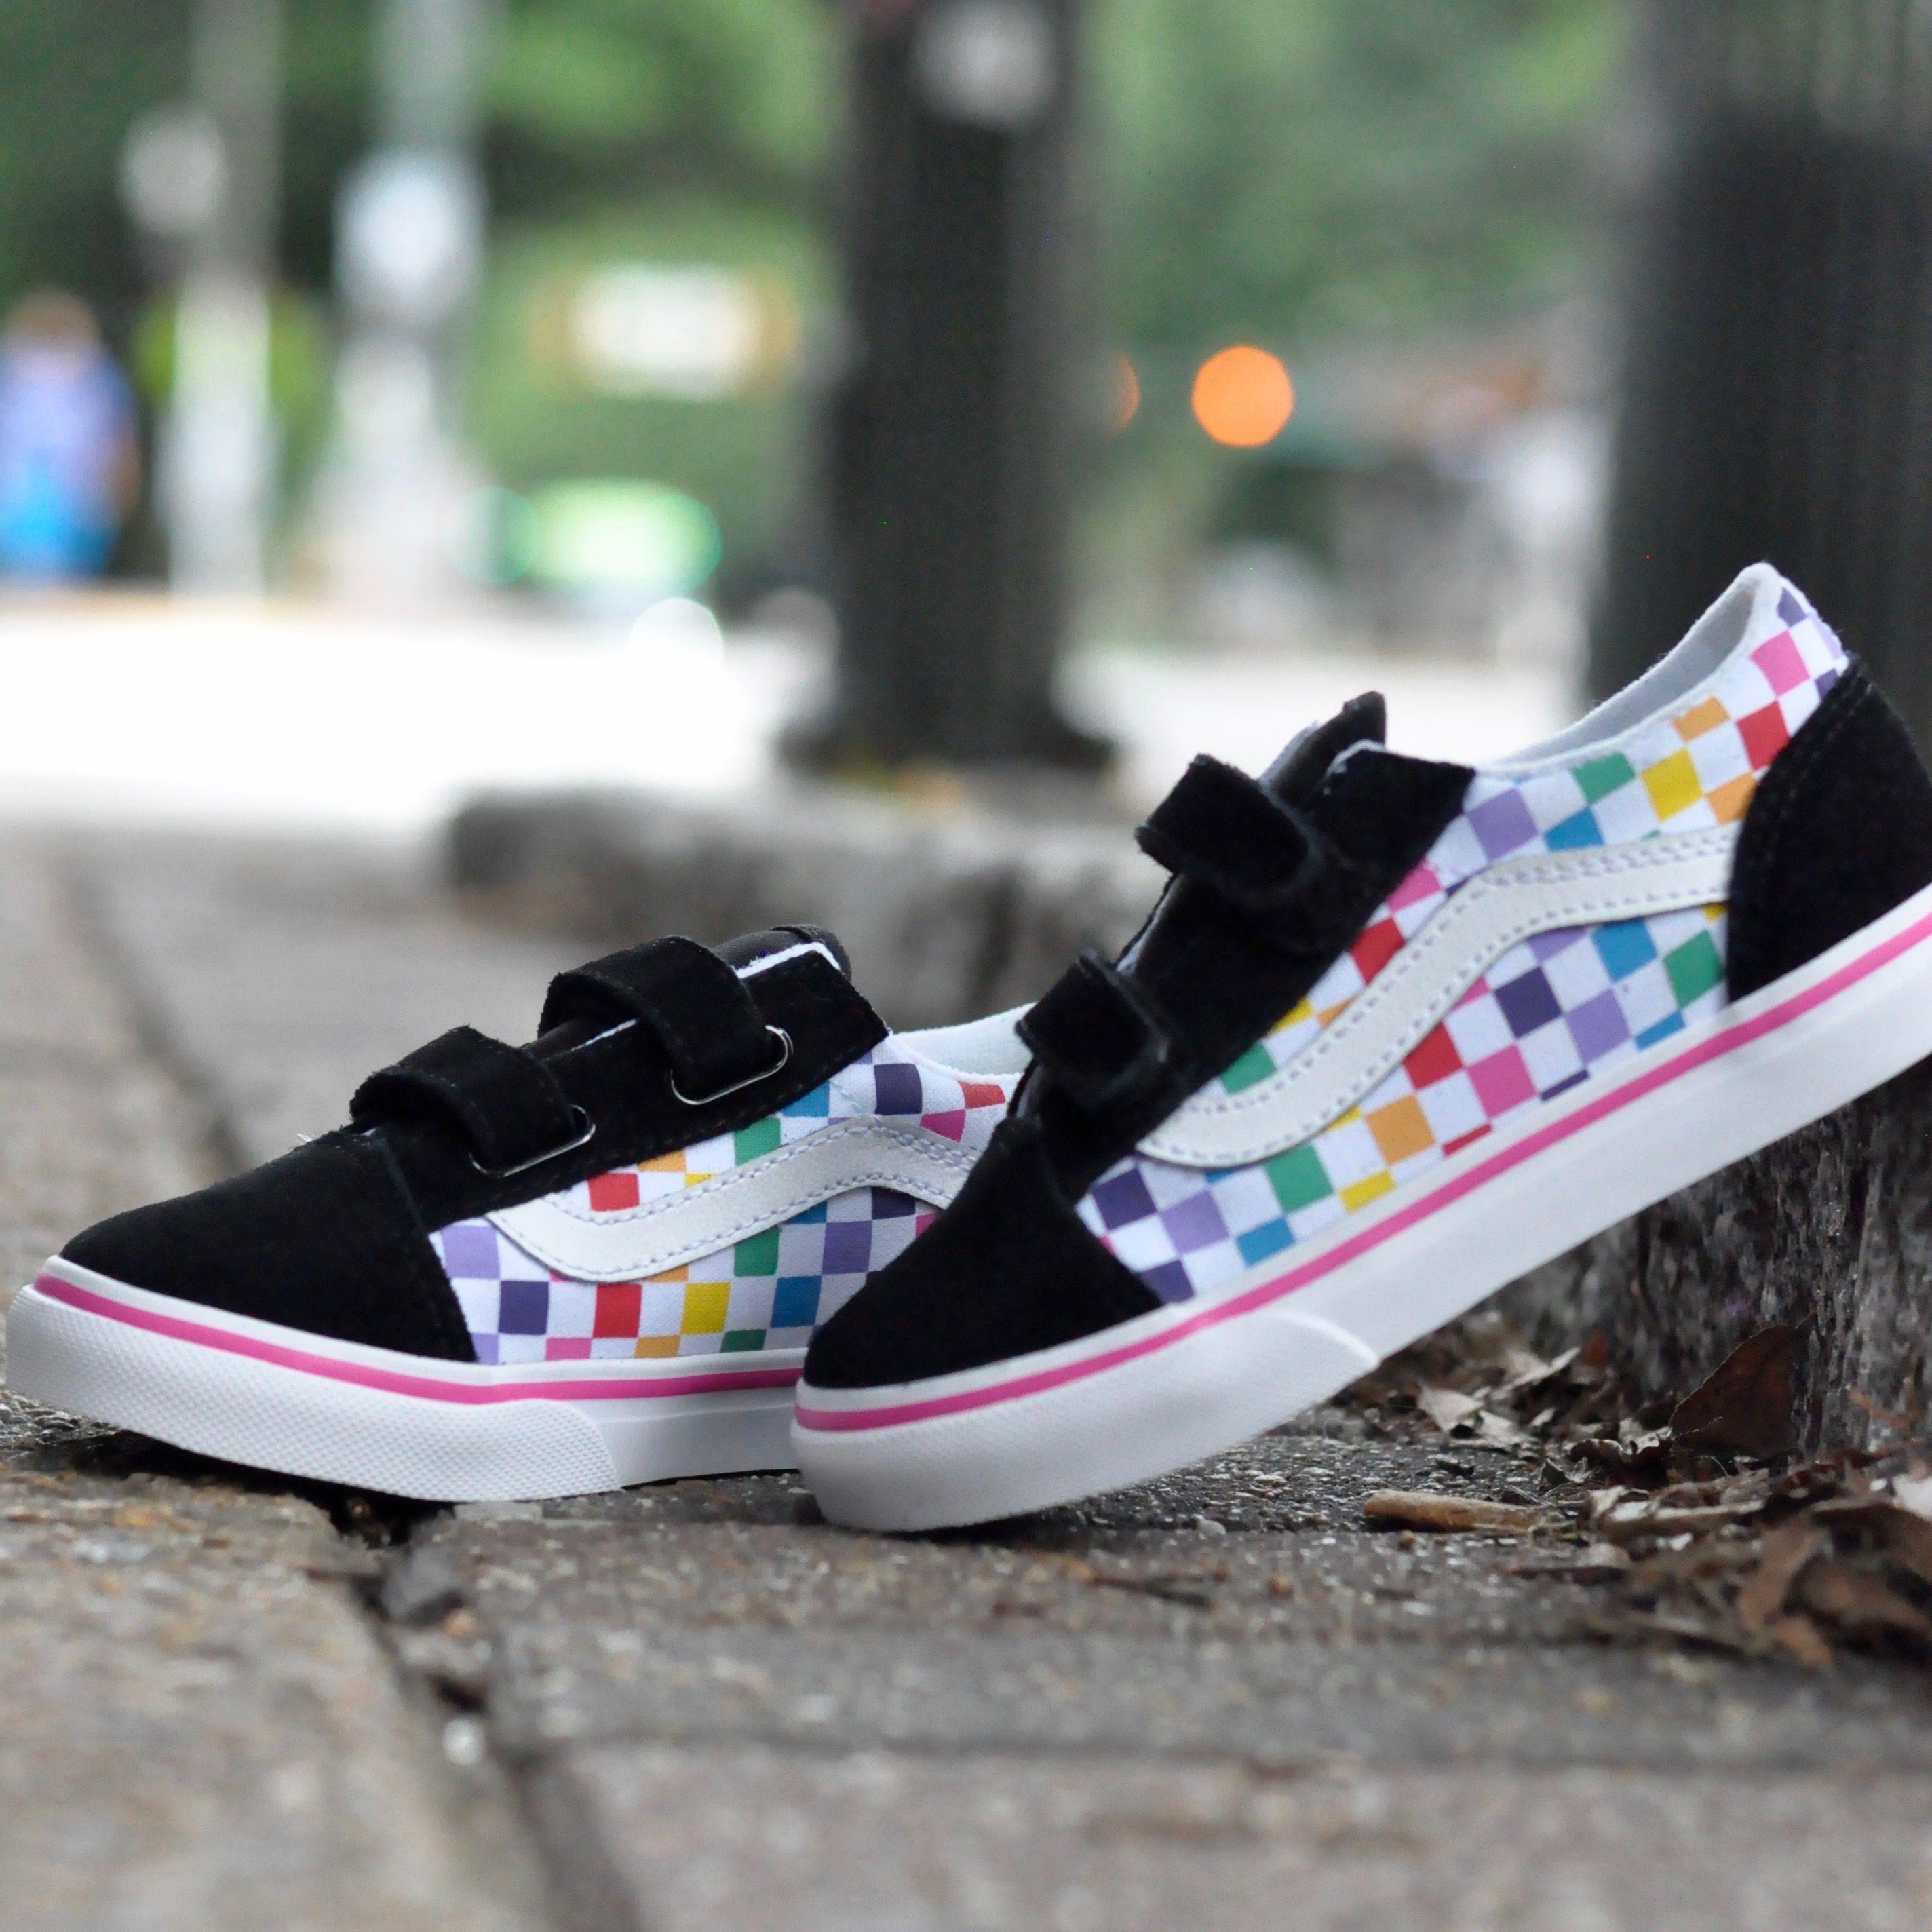 Old Skool Rainbow with velcro straps | Vans shoes kids, Shop